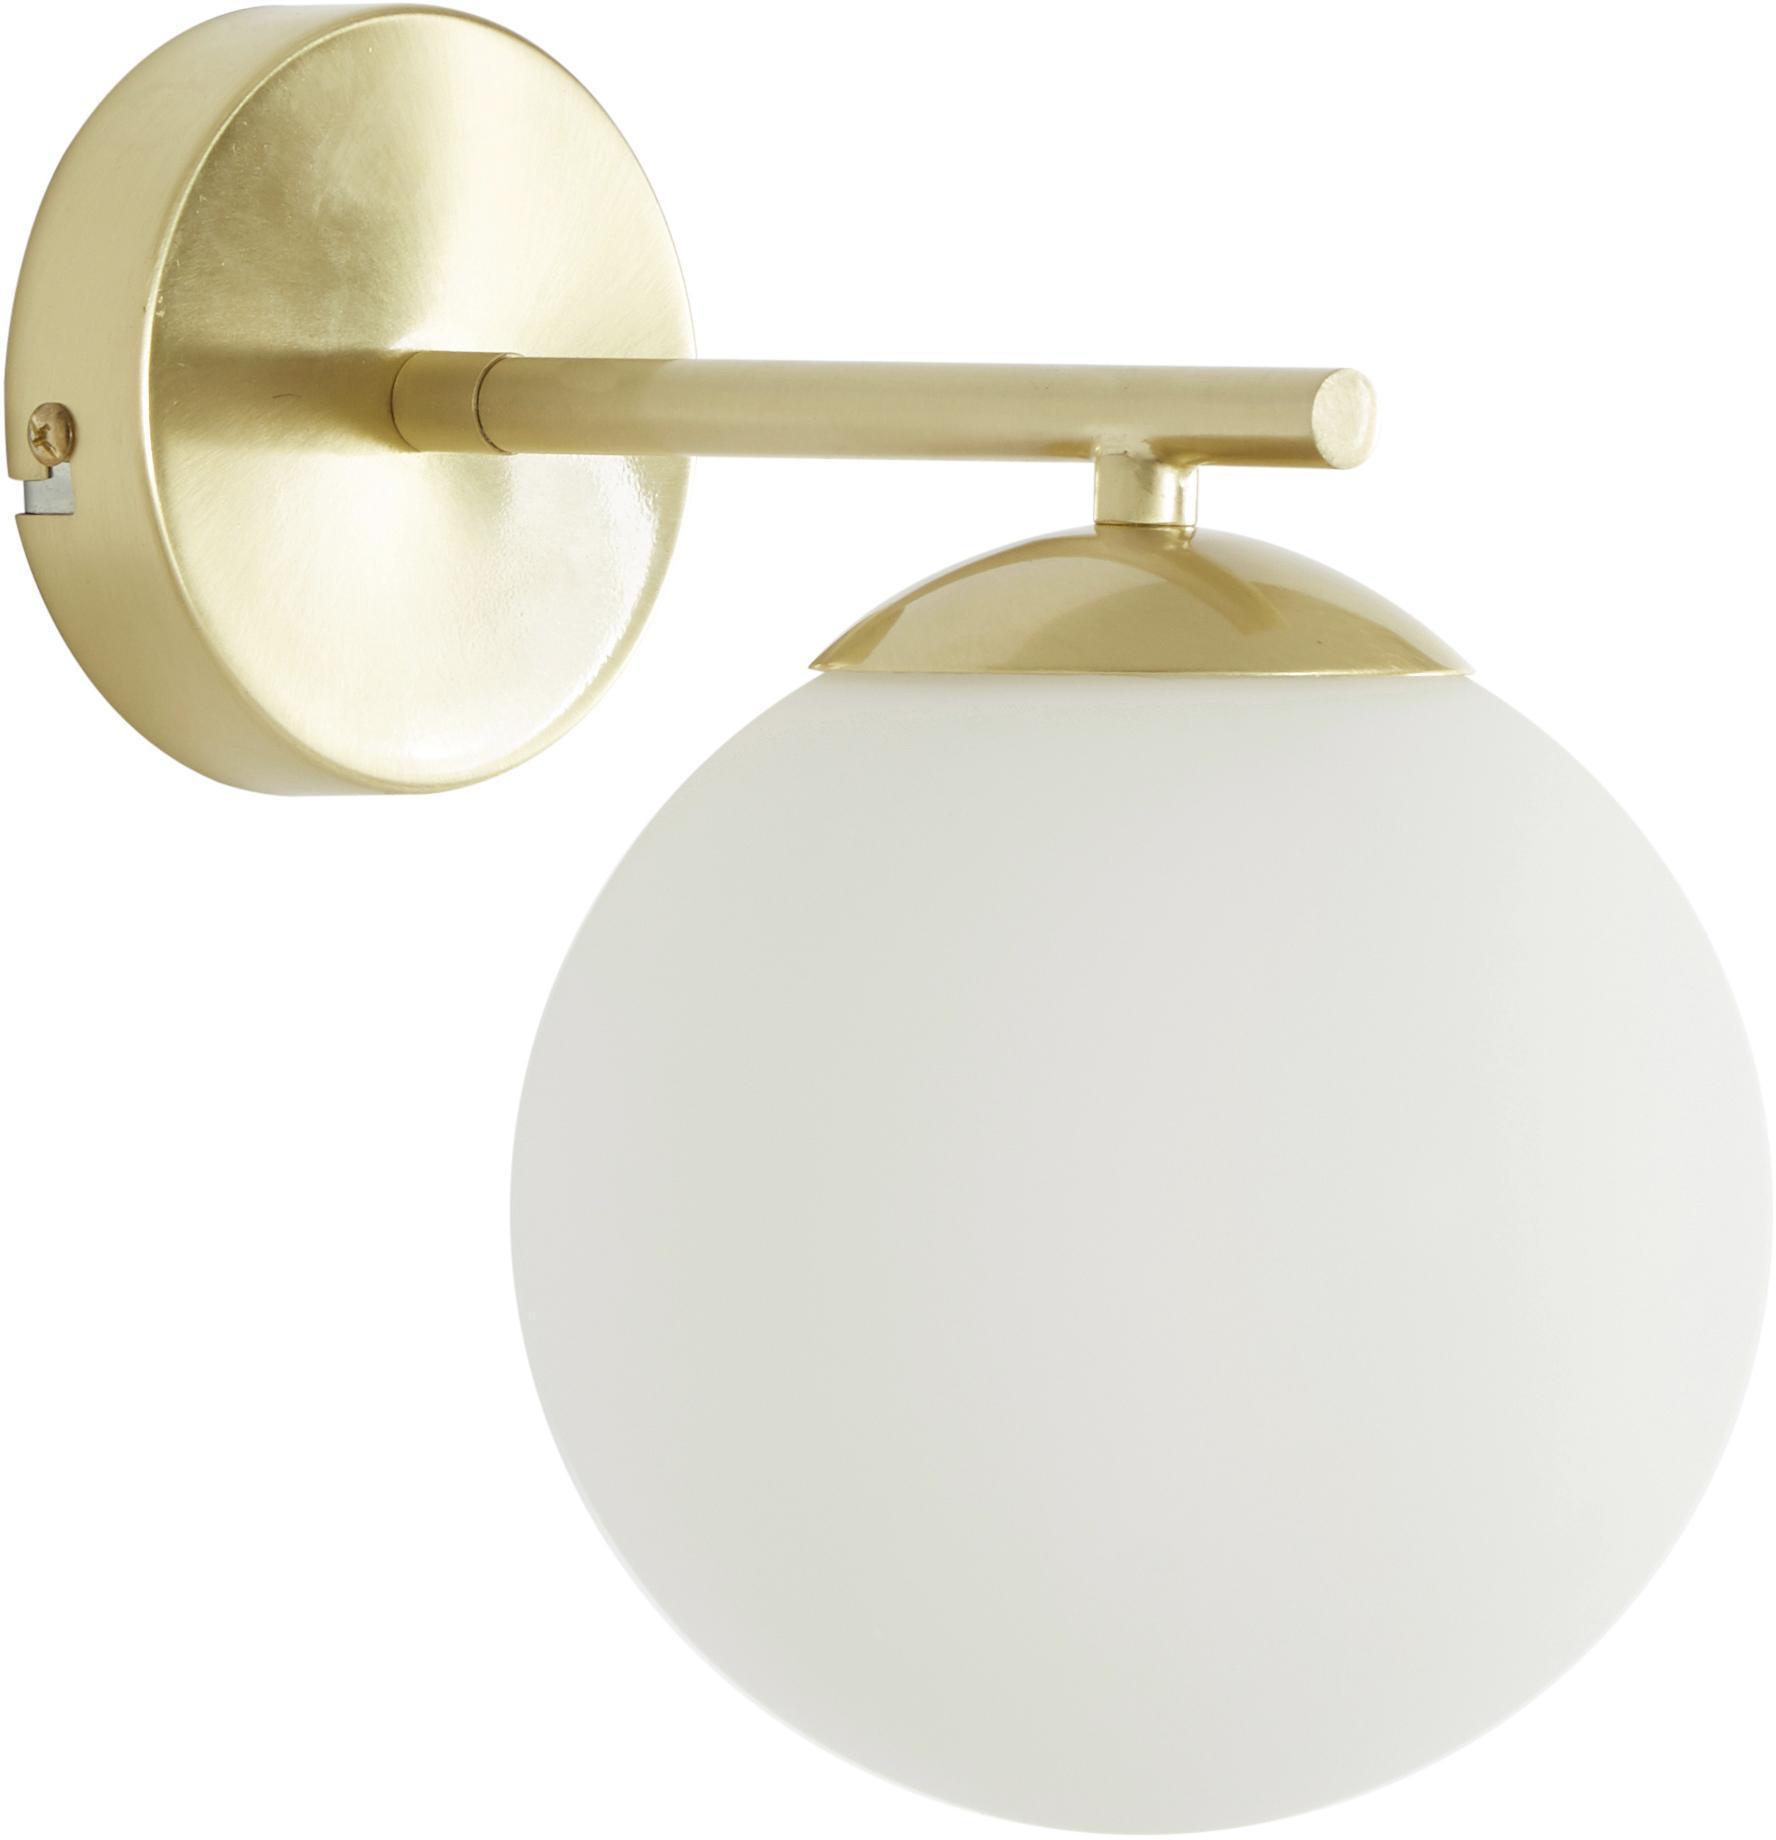 Applique Liv, Paralume: vetro, Bianco, ottone, Larg. 15 x Alt. 22 cm